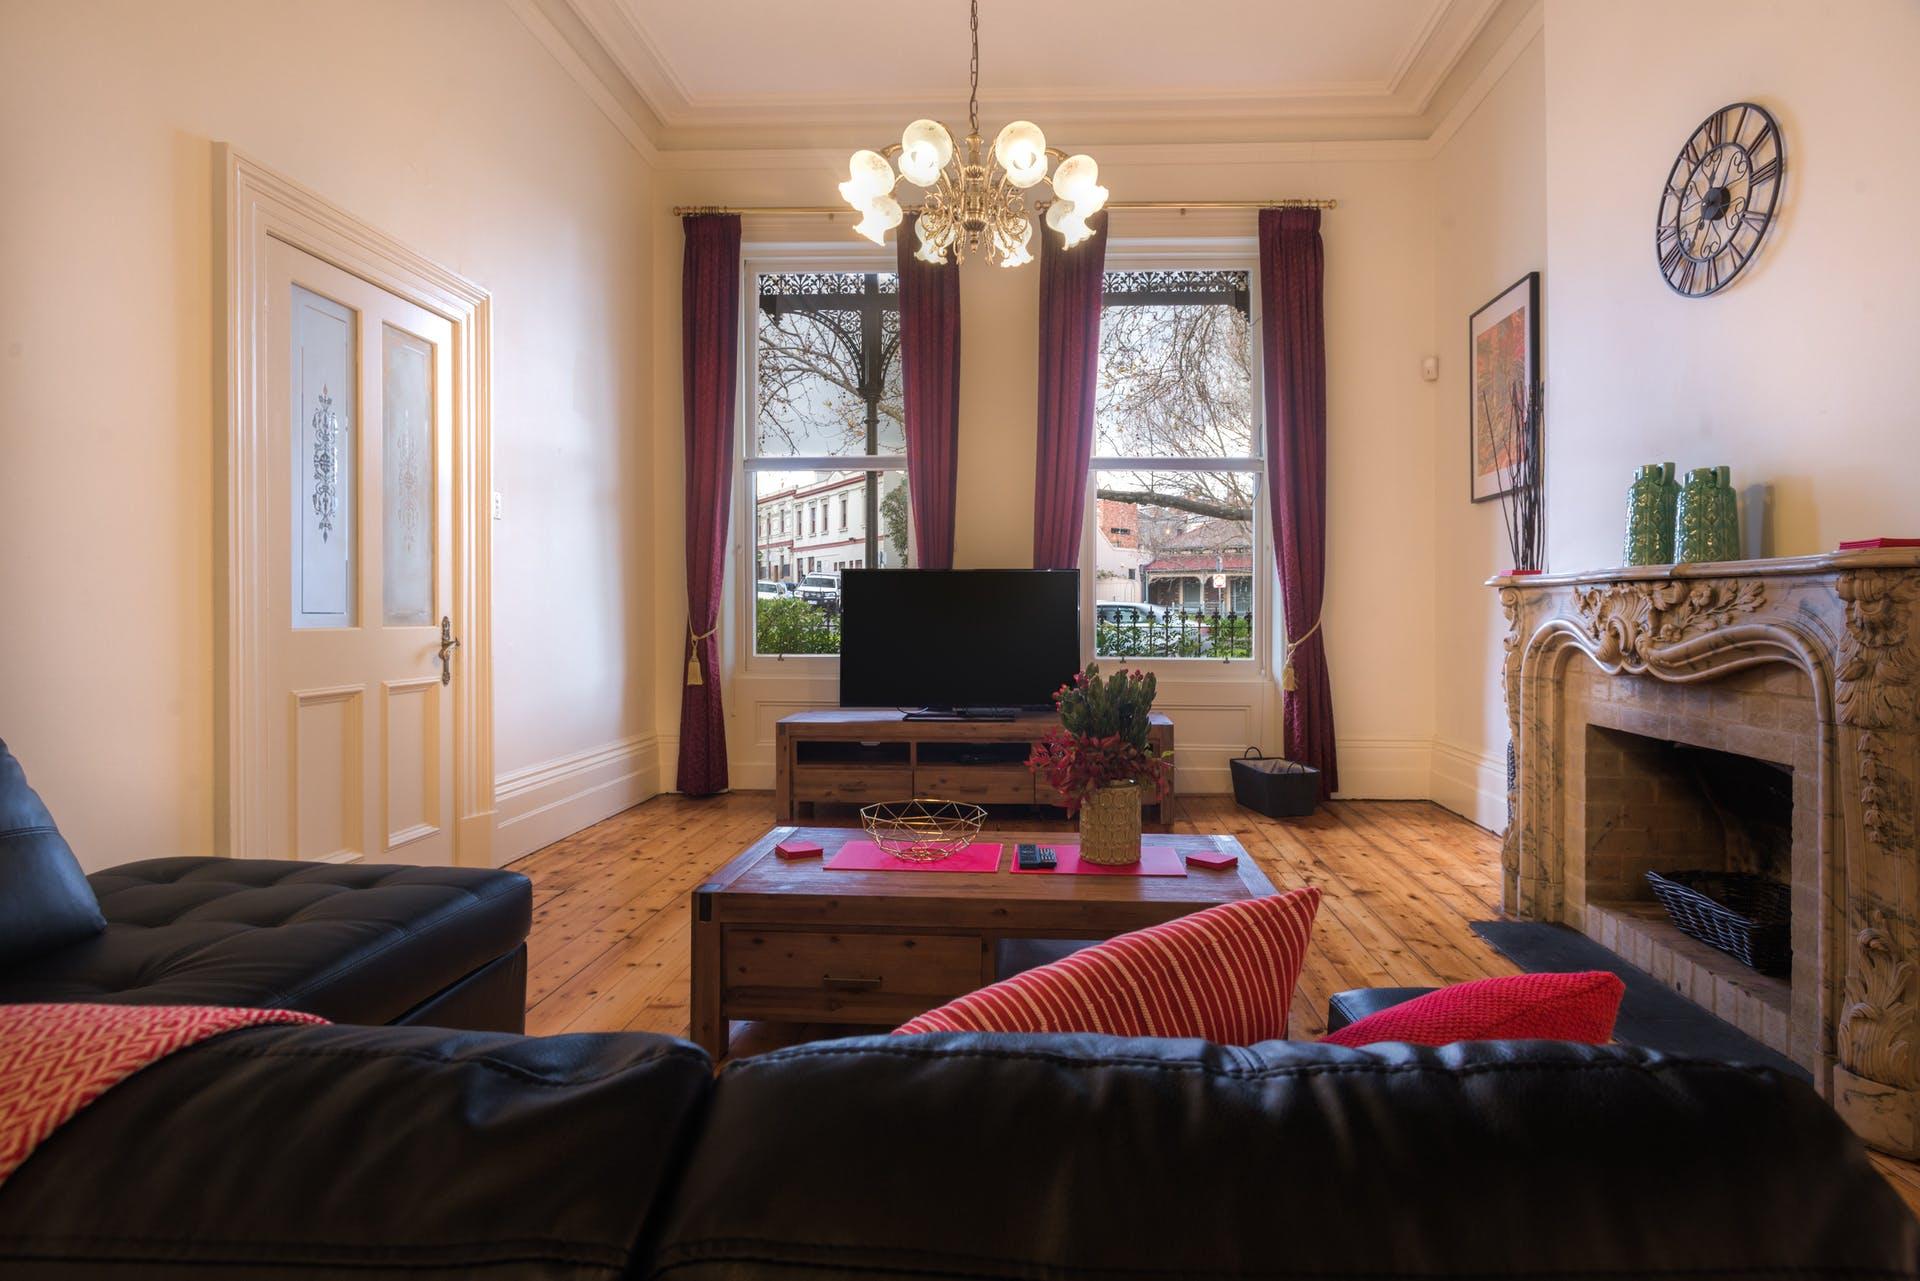 601-king-street-west-melbourne-student-accommodation-Melbourne-Living-Area-Unilodgers